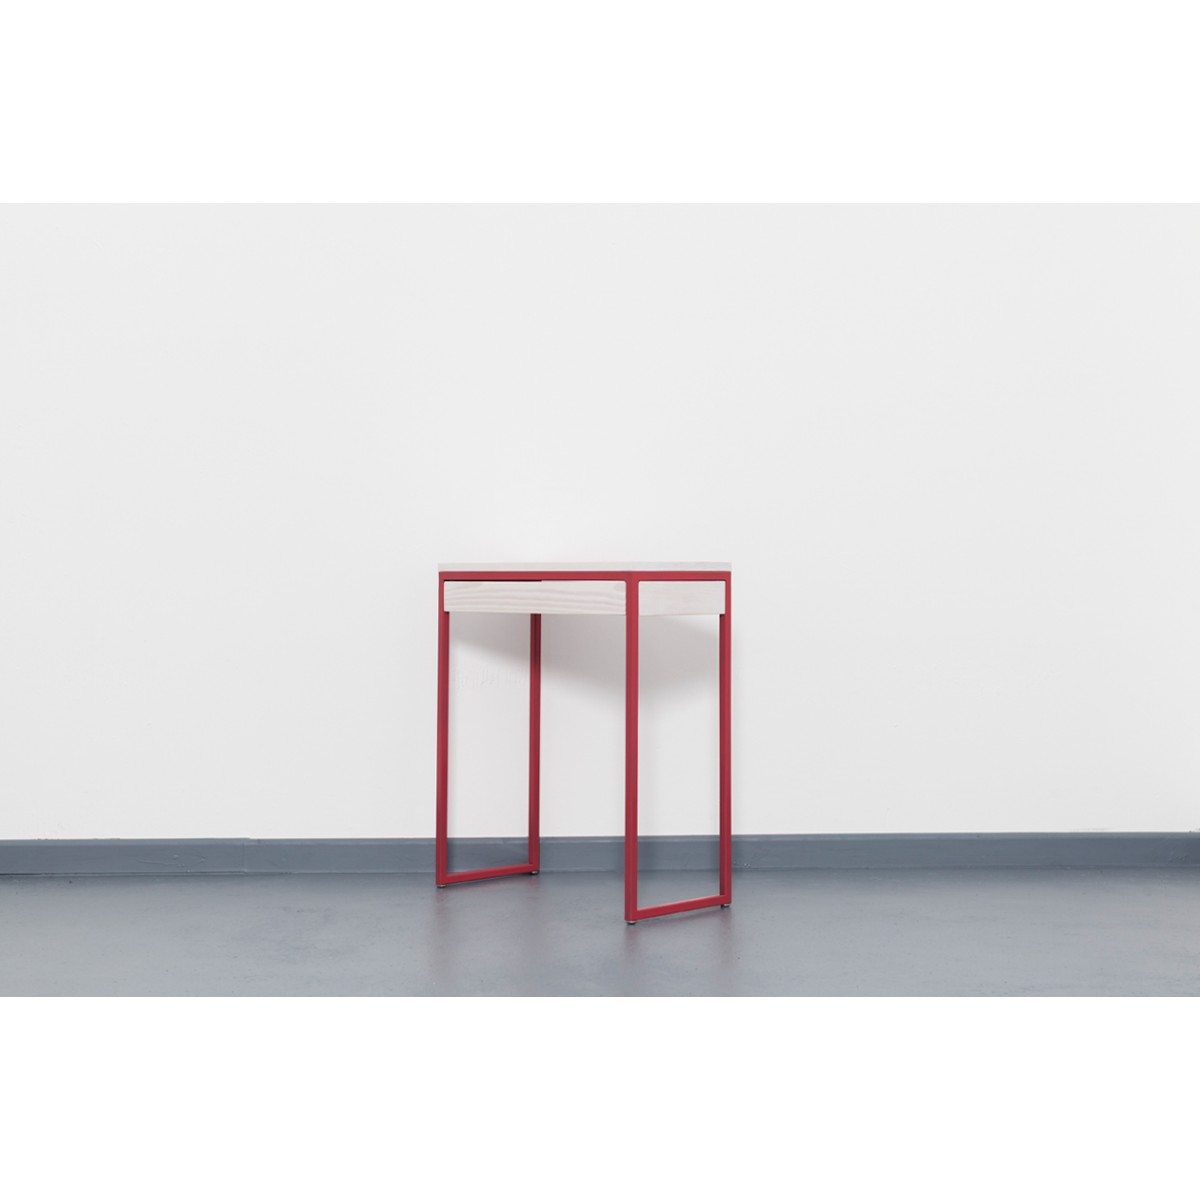 upcycling konsolentisch mit schublade in strawberry red thorn. Black Bedroom Furniture Sets. Home Design Ideas